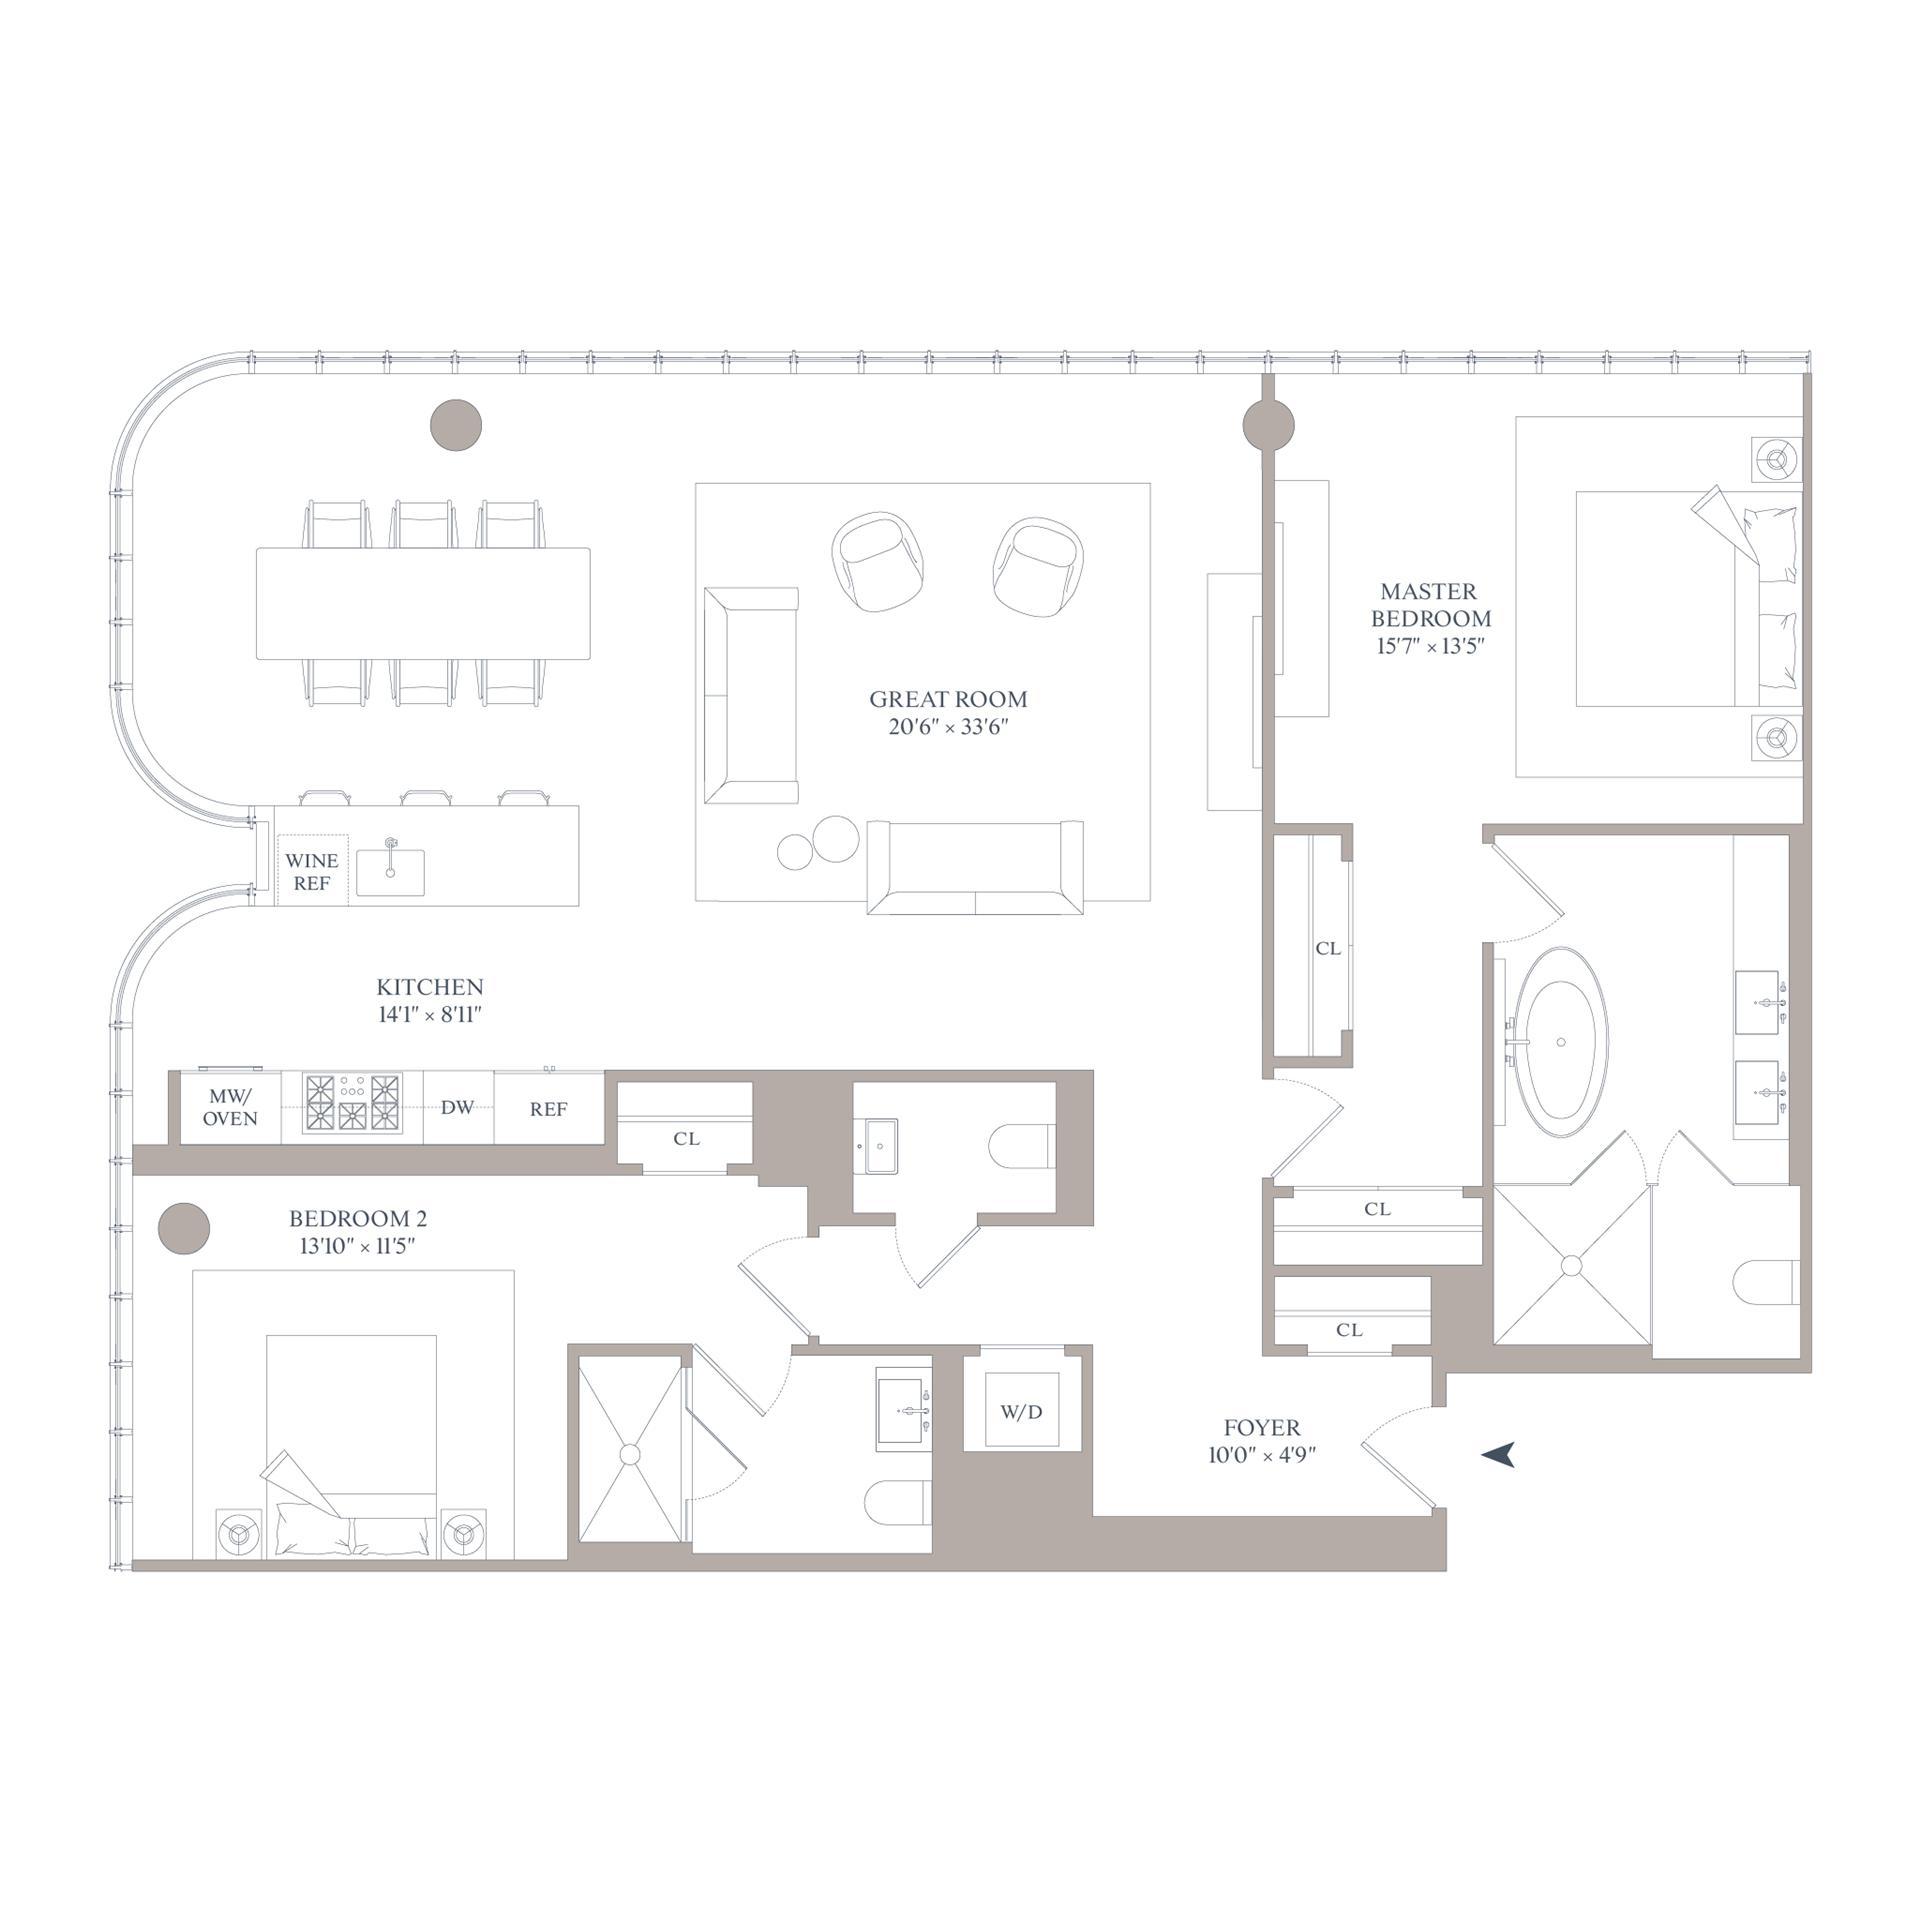 Floor plan of 565 Broome St, N11C - SoHo - Nolita, New York